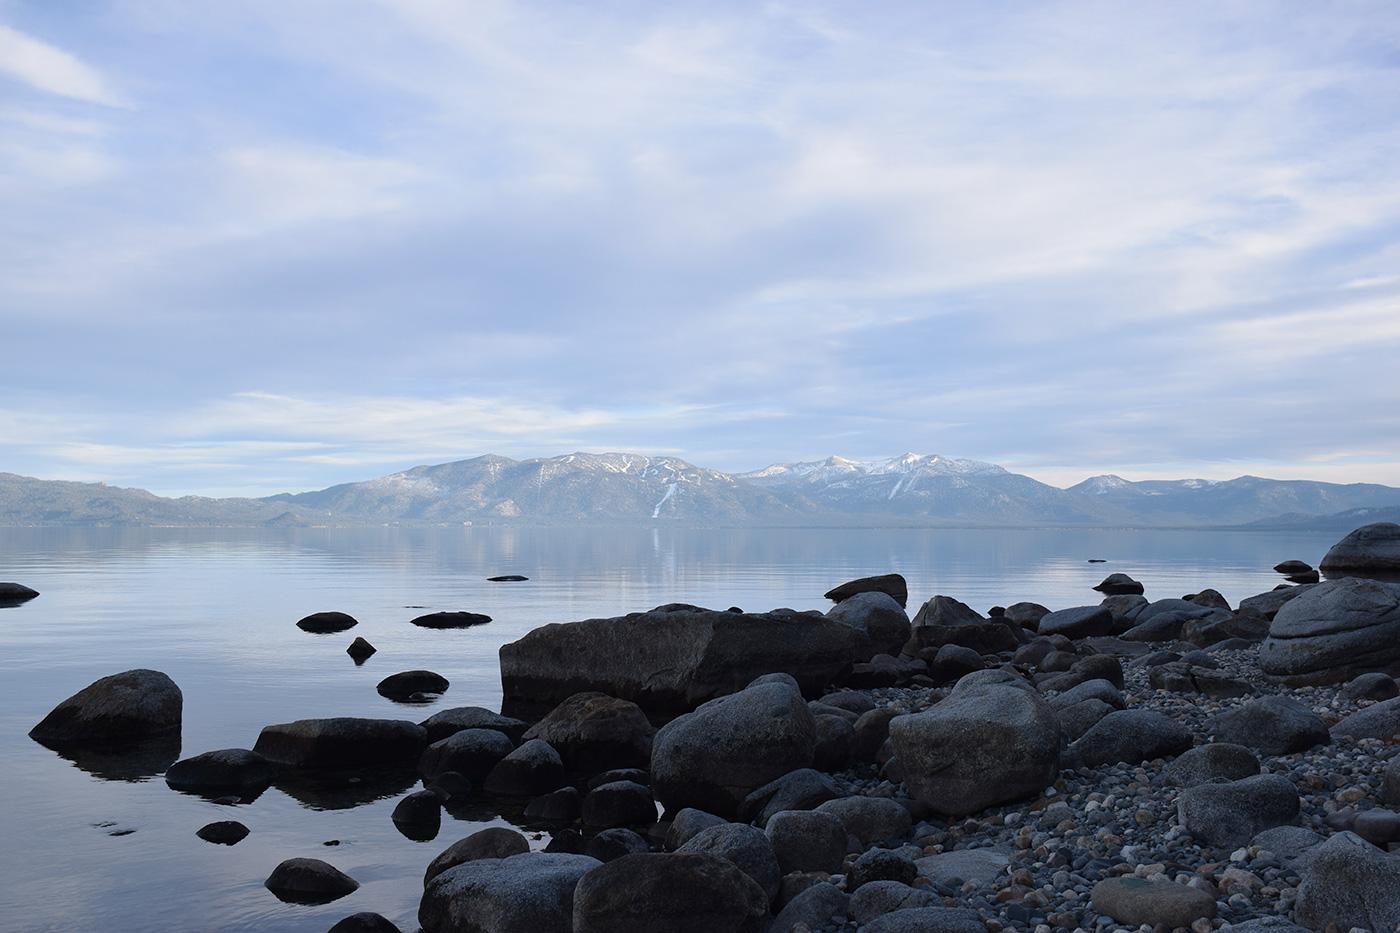 lake-tahoe-sugar-pine-point-hike-across-to-south-shore.jpg